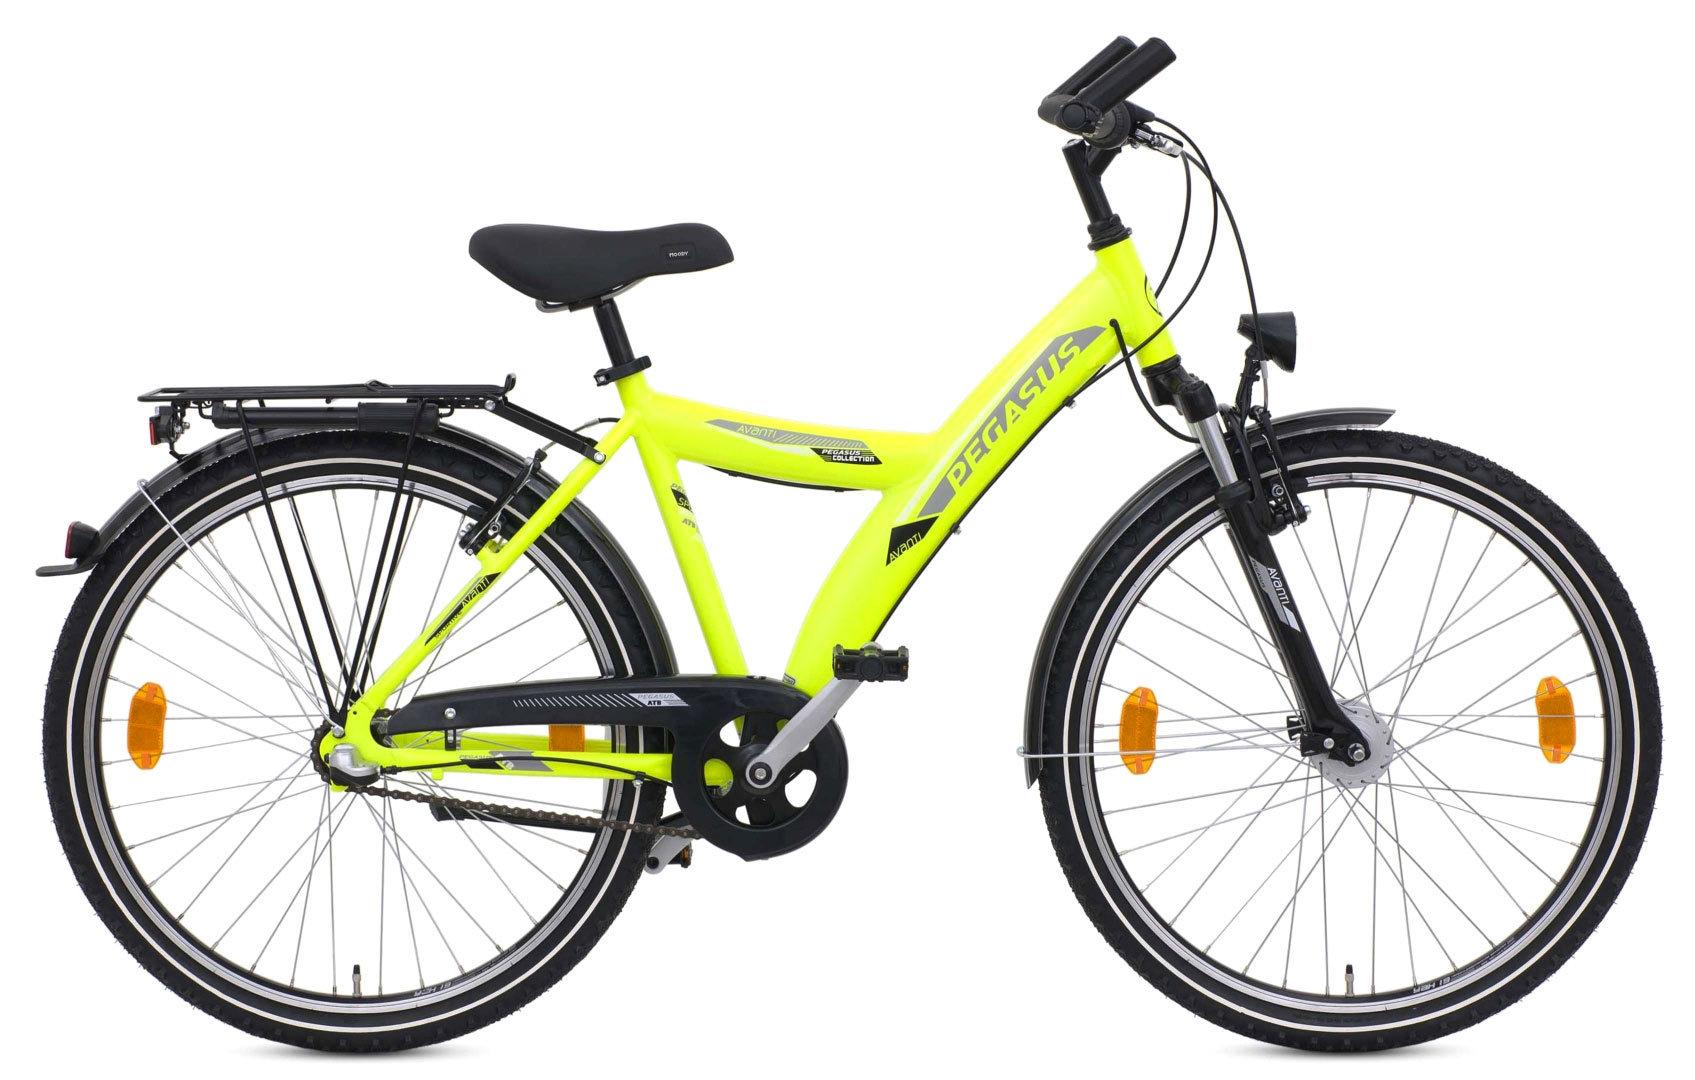 jugend fahrrad pegasus avanti 26 zoll shimano 7 gang 38 cm. Black Bedroom Furniture Sets. Home Design Ideas